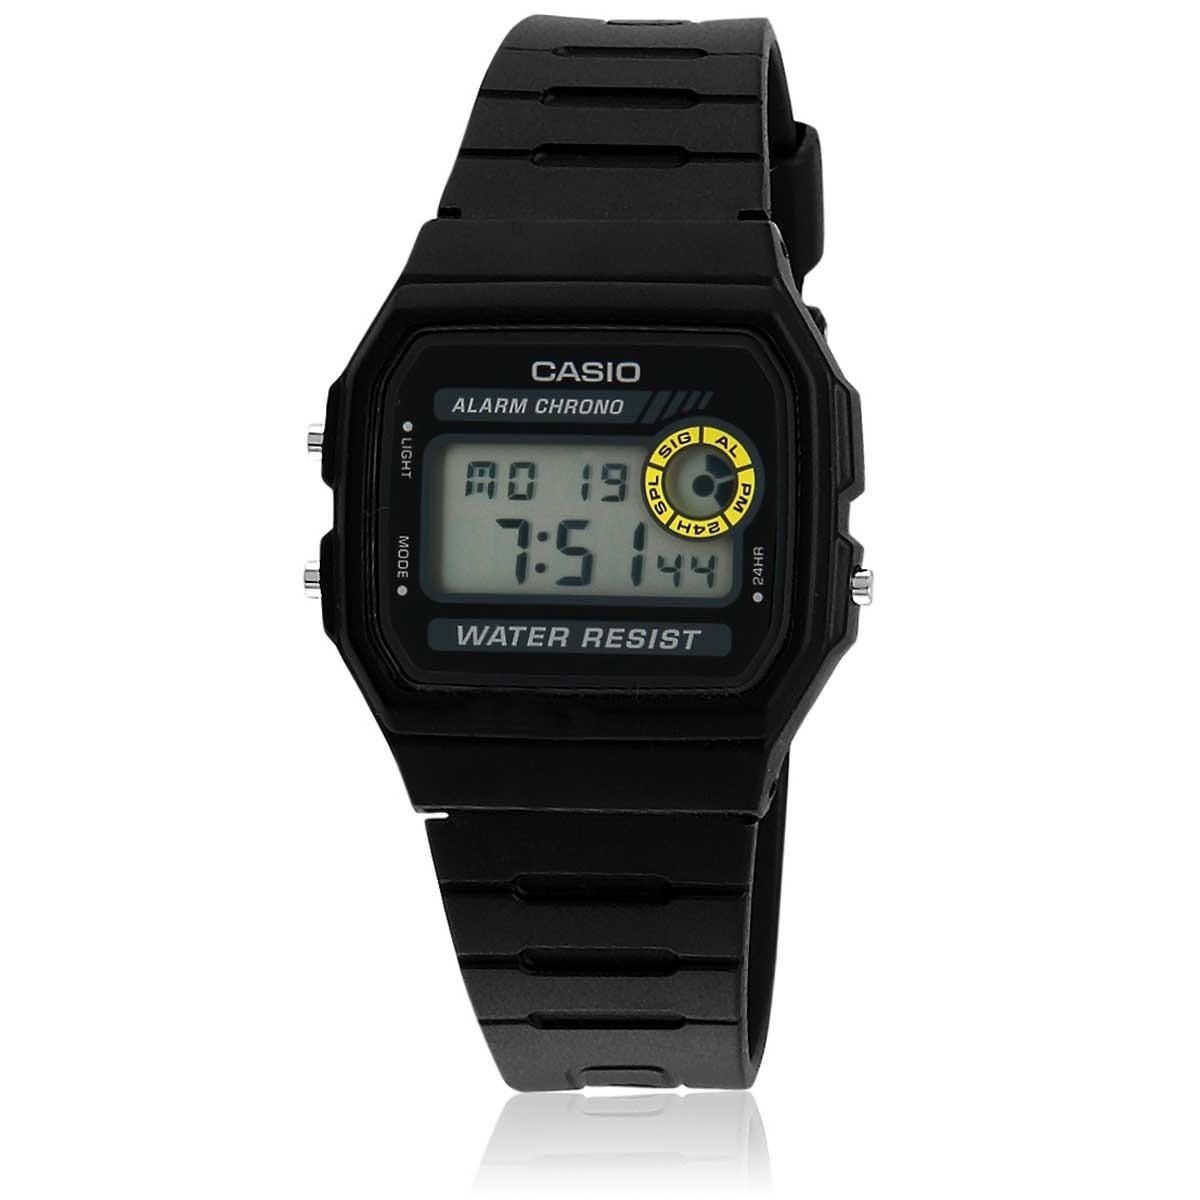 20fbf80dd27 Relógio Casio Standard Digital Unissex F-94wa-8dg - R  125